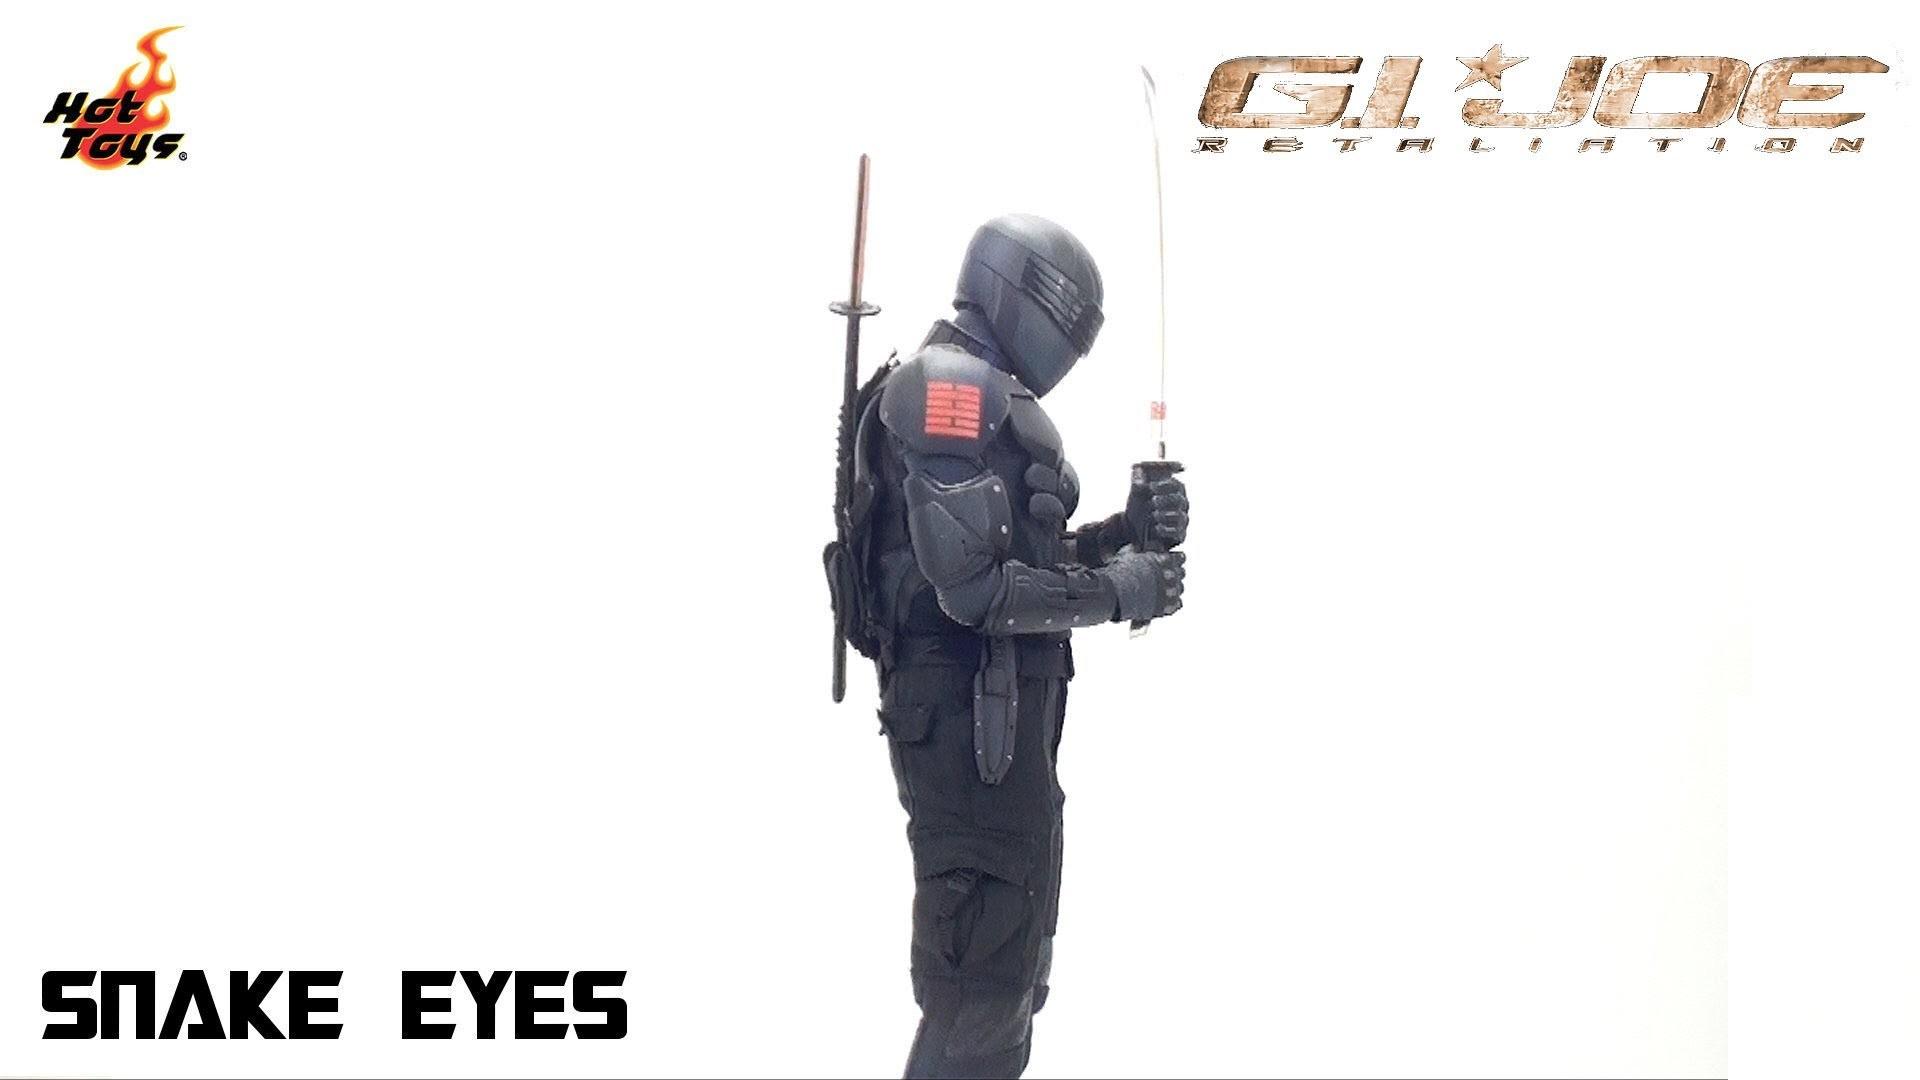 Video Review of the Hot Toys G.I. Joe: Retaliation: Snake Eyes – YouTube